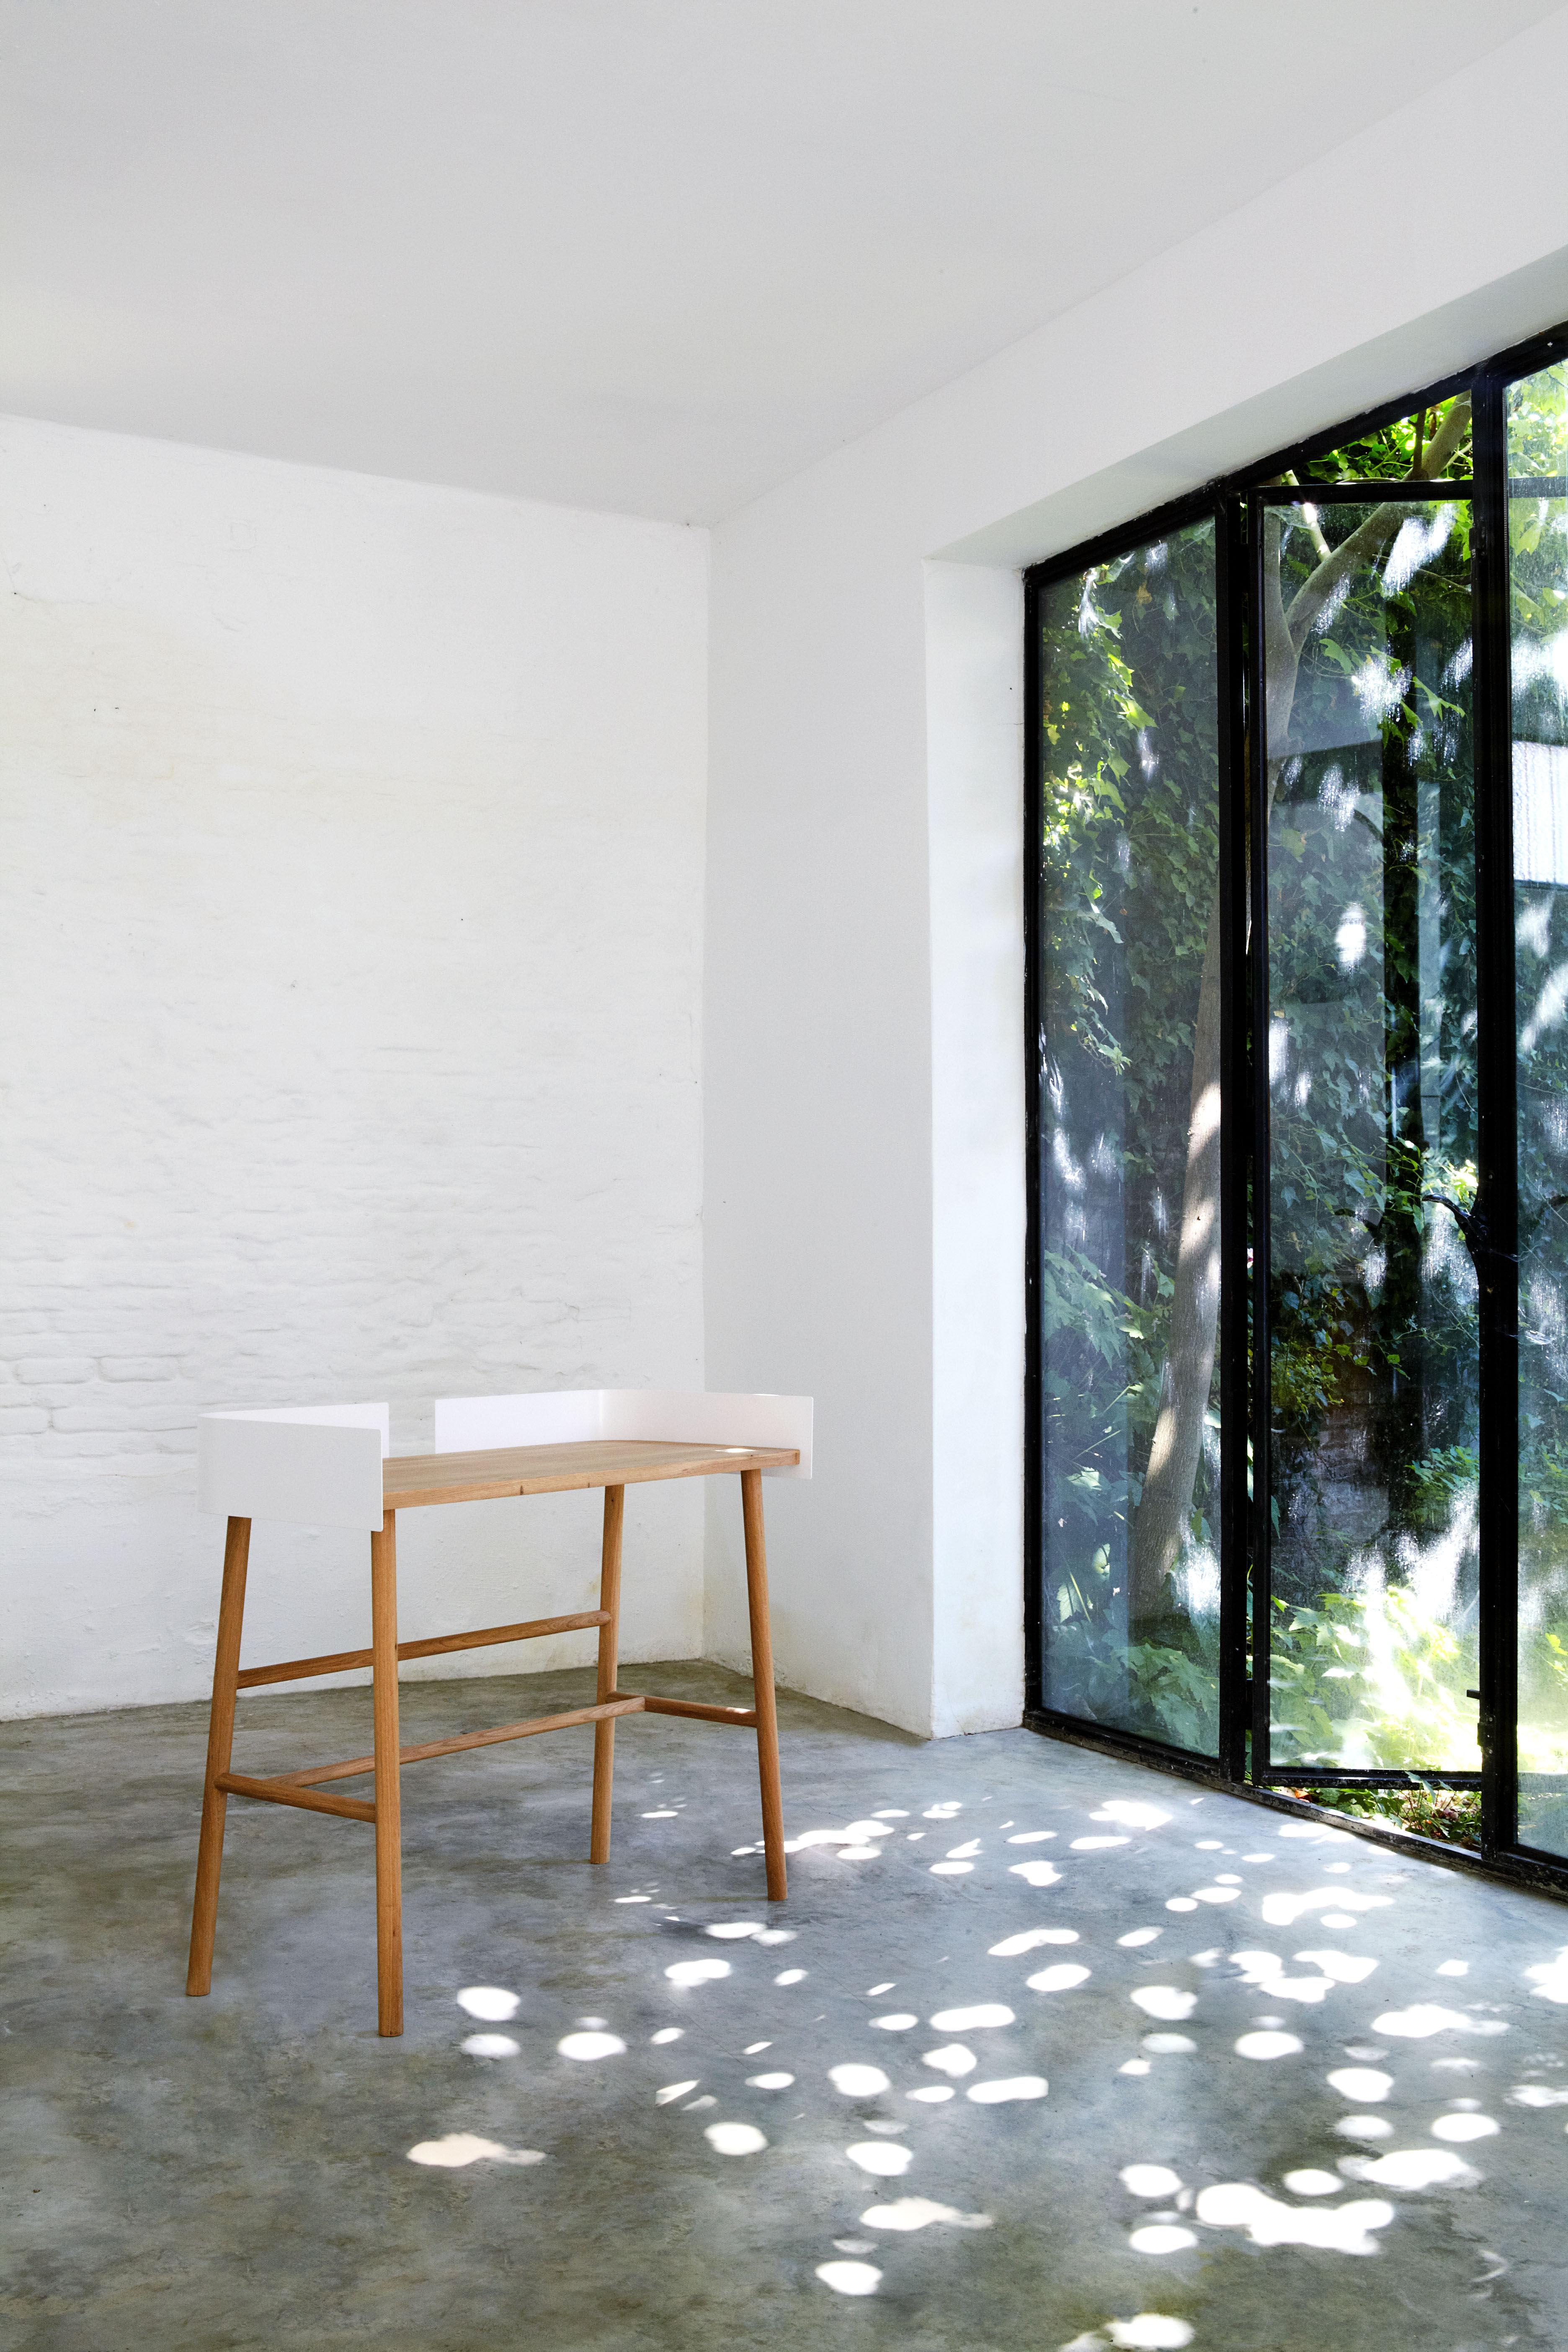 b desk 100 x 45 cm universo positivo schreibtisch. Black Bedroom Furniture Sets. Home Design Ideas